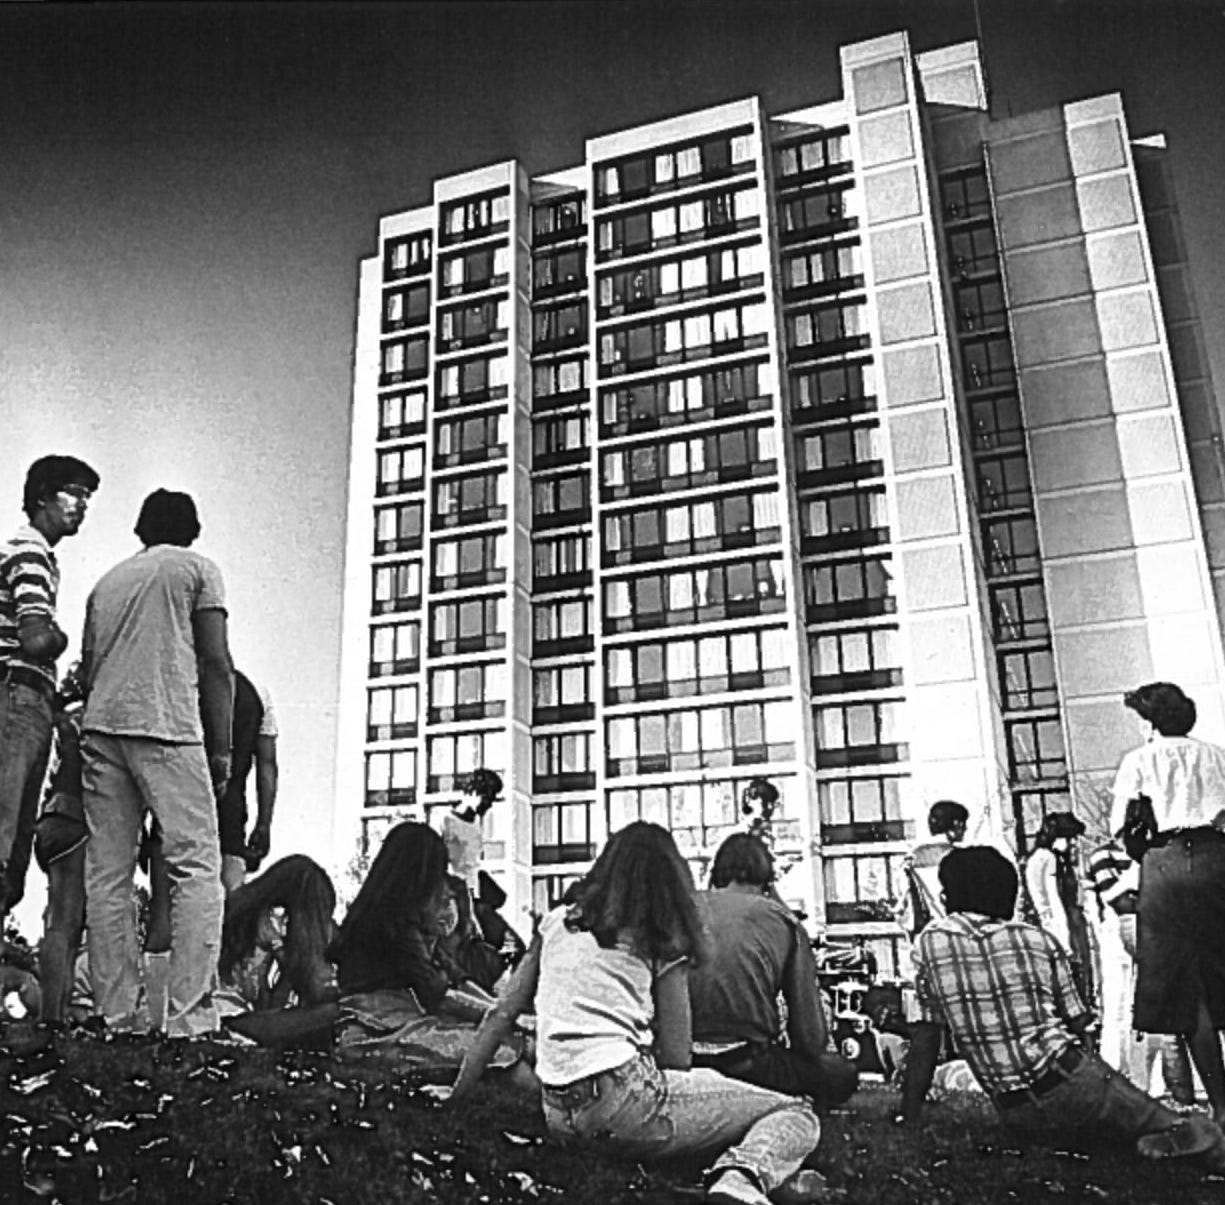 University of Delaware abruptly closing landmark Christiana Towers residence halls